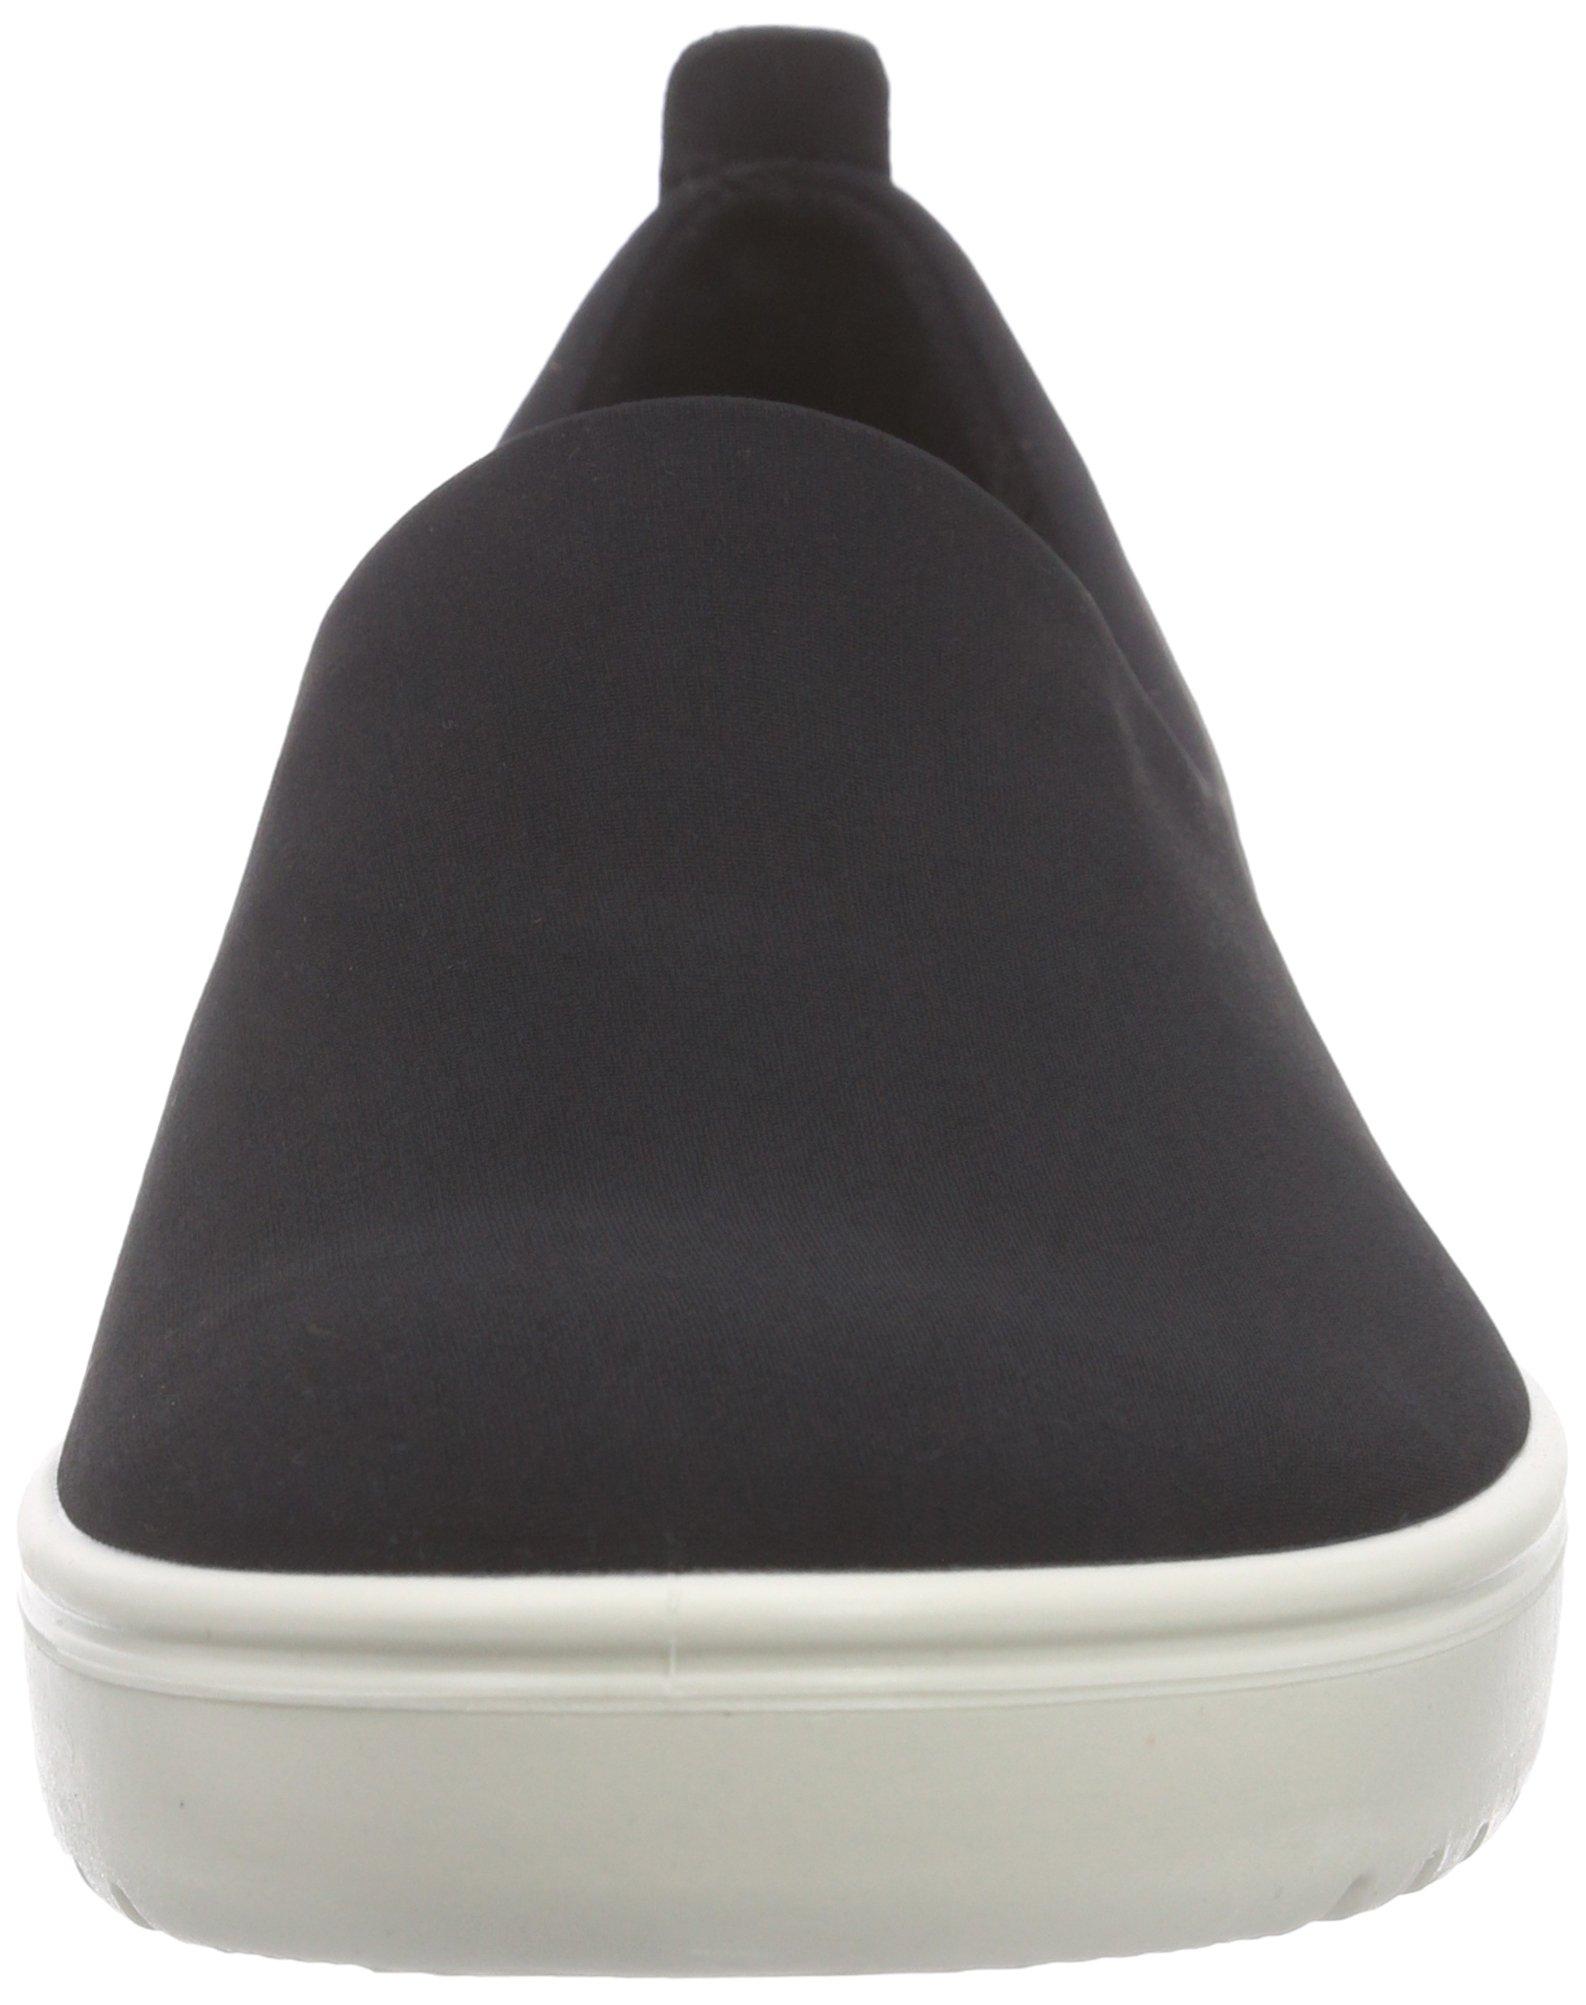 Ecco Footwear Womens Fara Slip-On Loafer, Black/Black, 42 EU/11-11.5 M US by ECCO (Image #4)